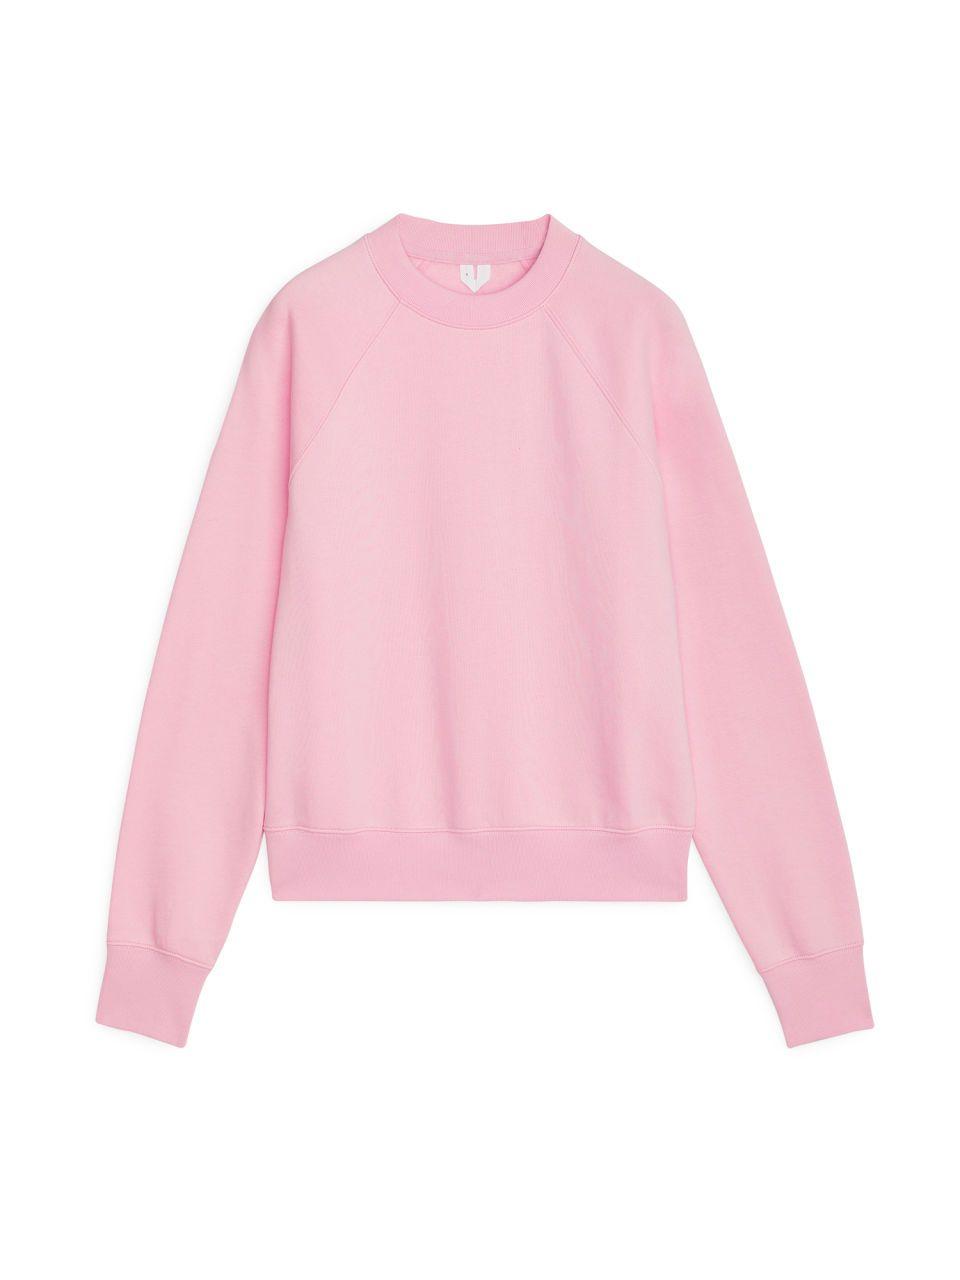 Pima Cotton Sweatshirt Light Pink Tops Arket Fr Cotton Sweatshirts Light Pink Tops Pink Crewneck Sweatshirt